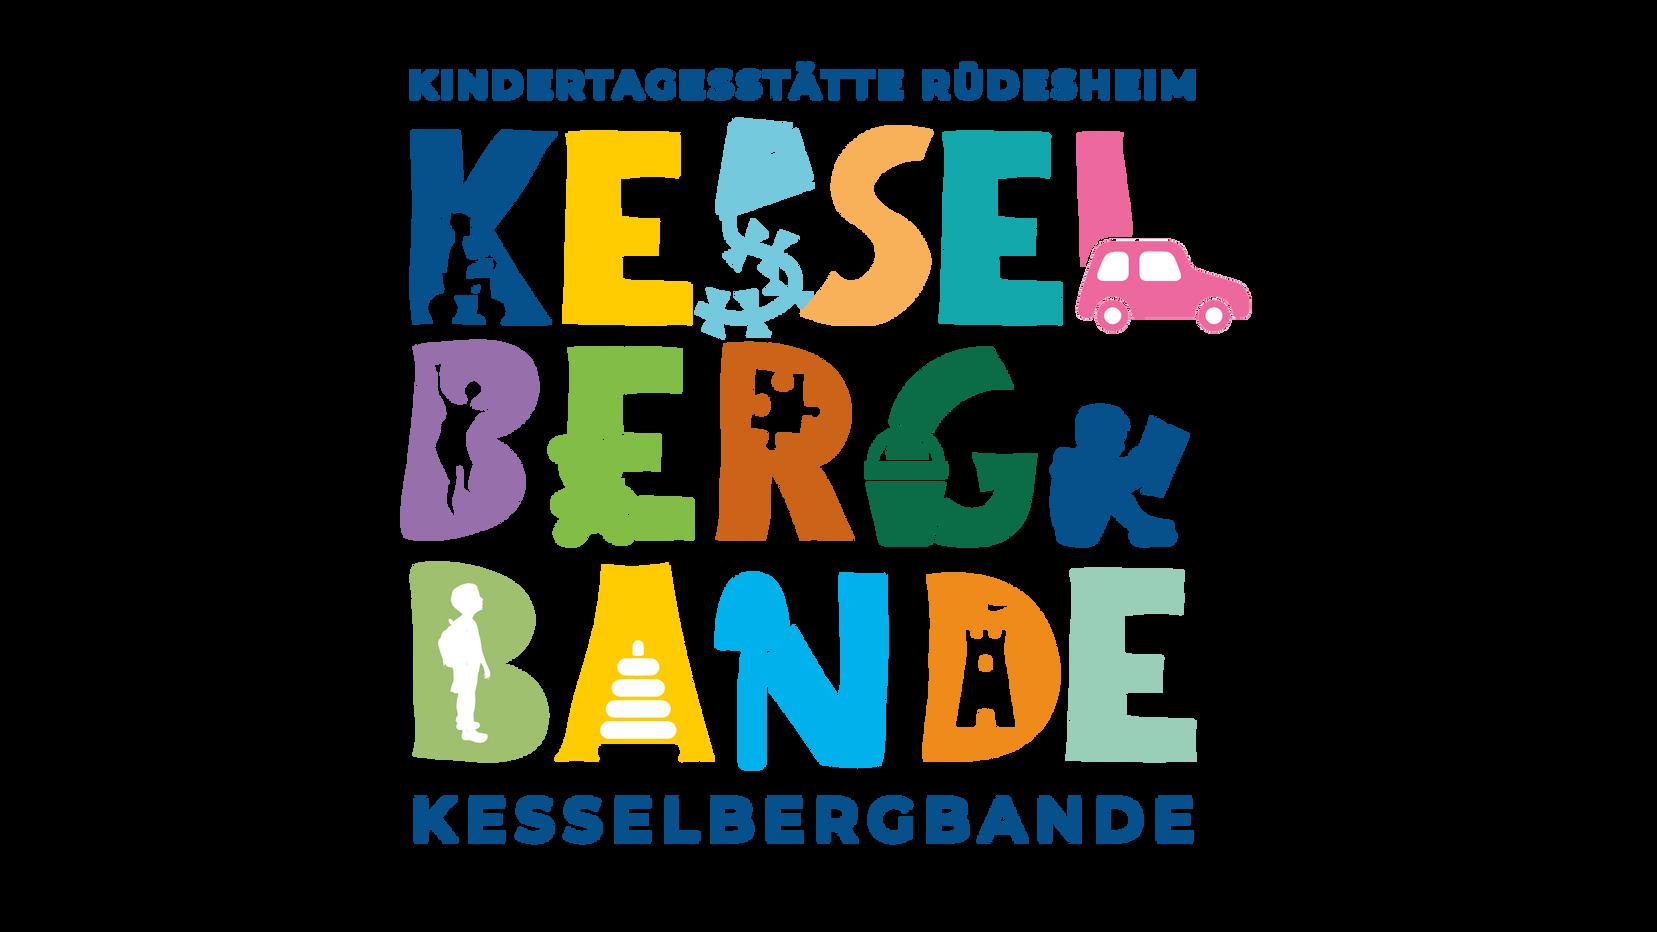 Kesselbergbande_final_dreizeilig.png